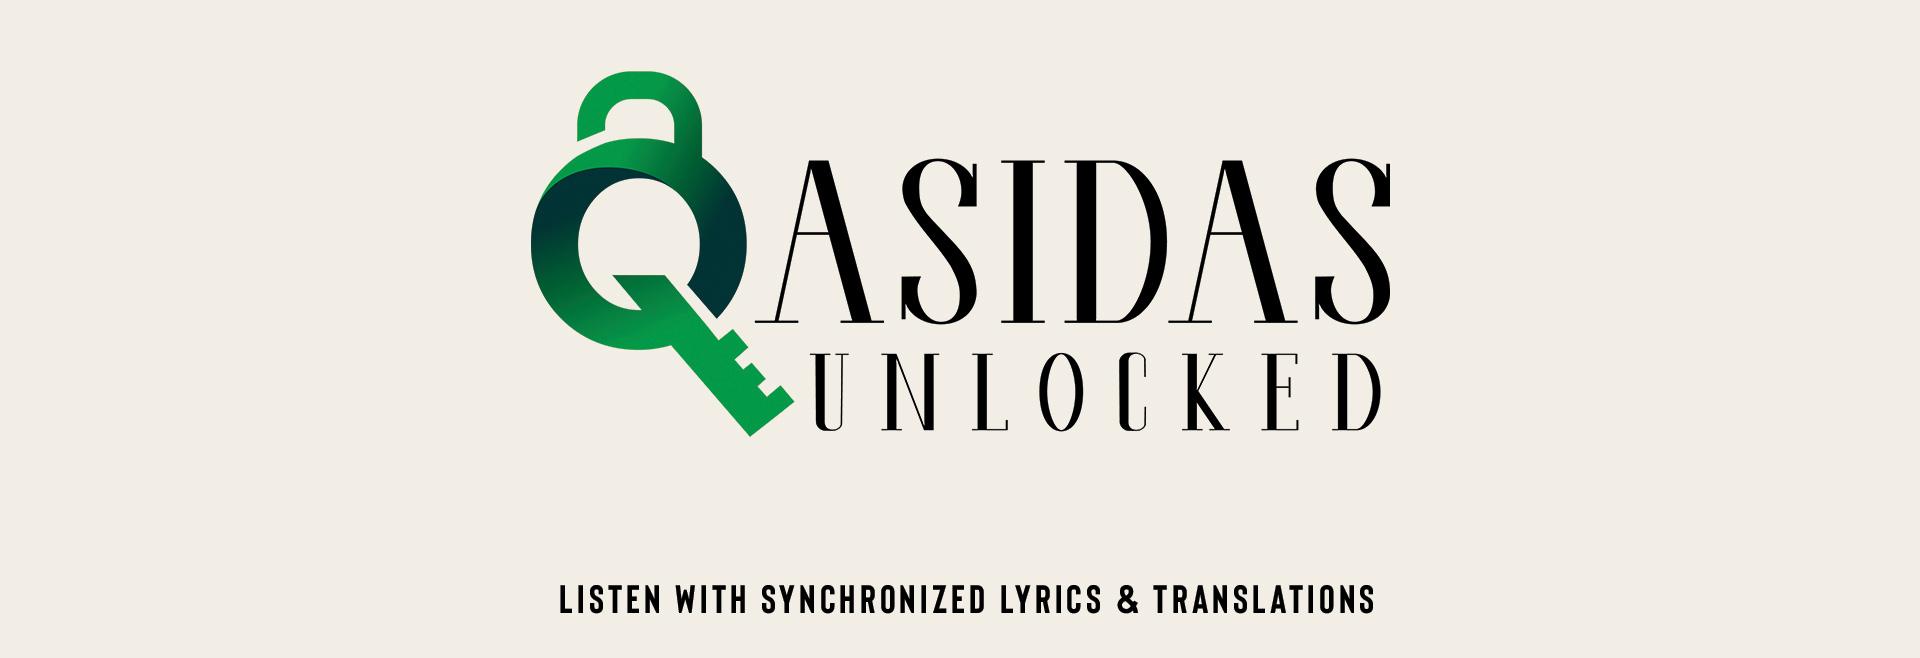 Qasidas Unlocked After Launch